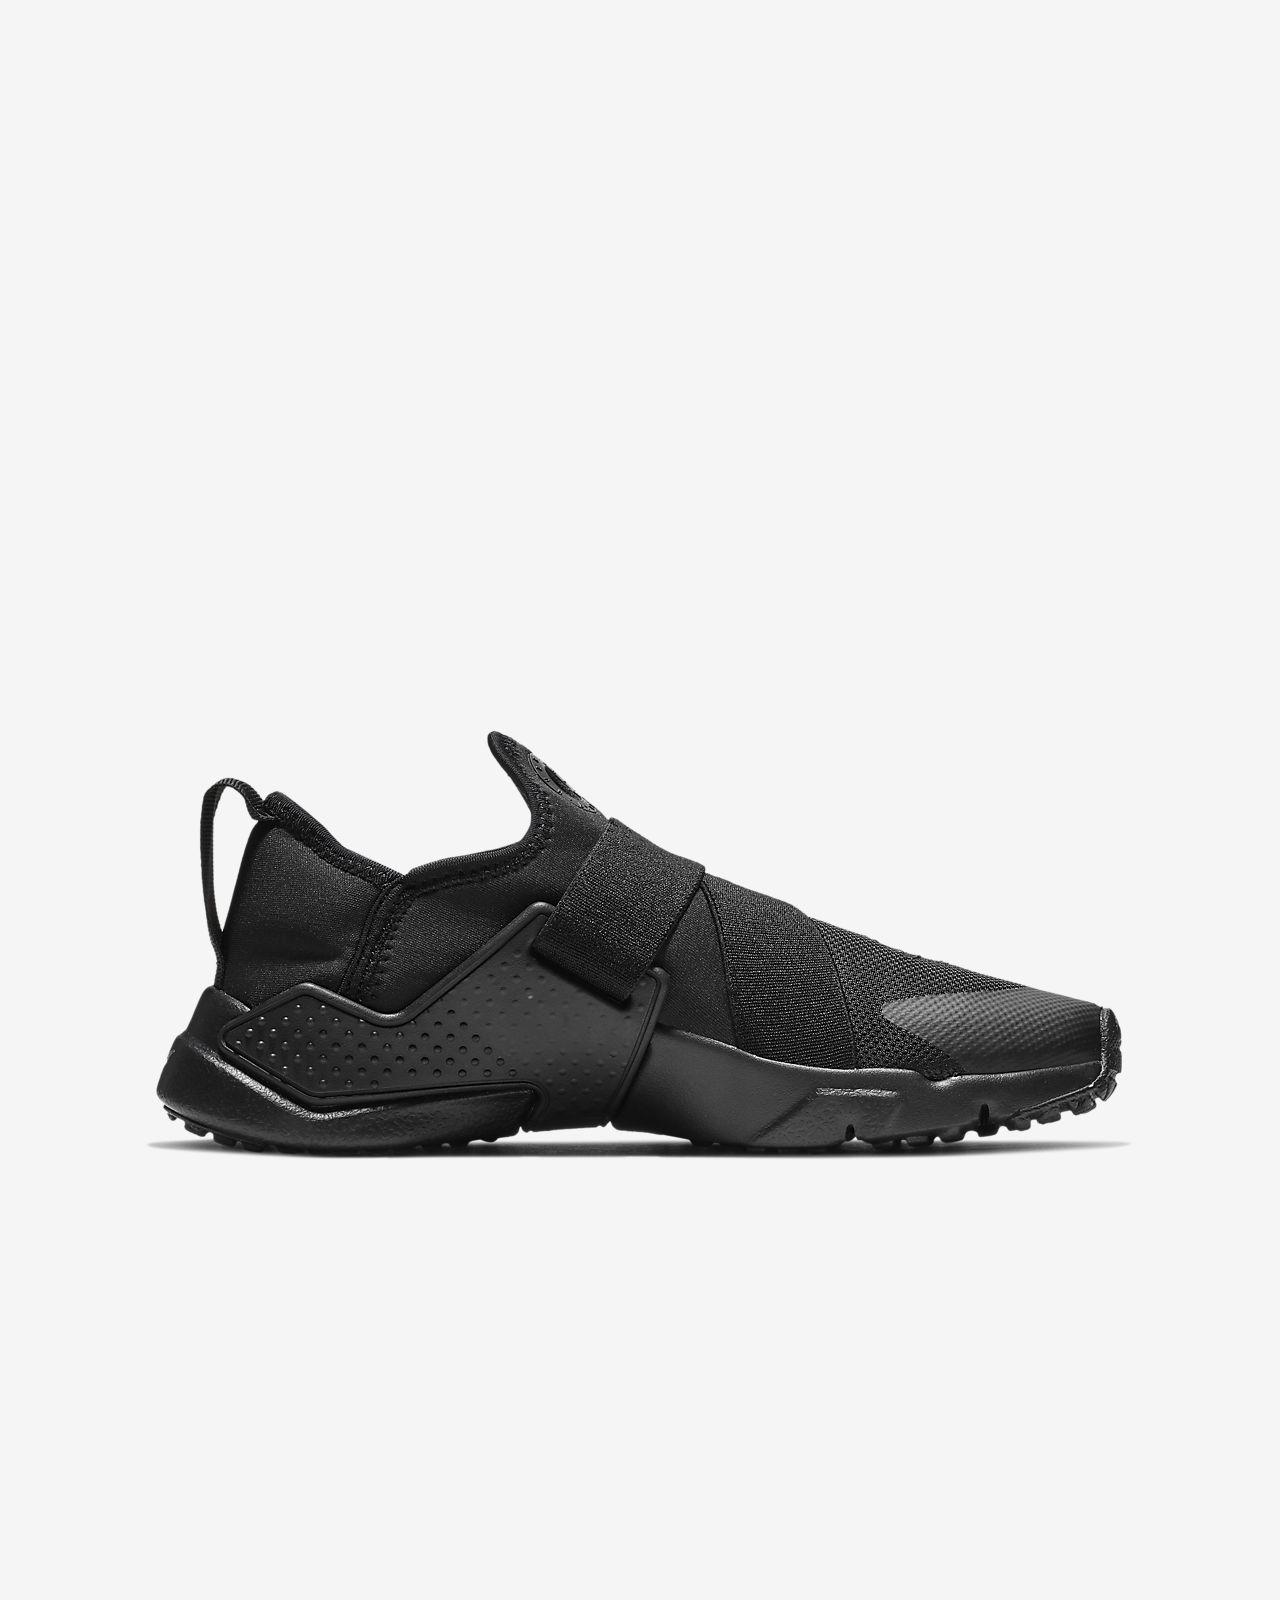 cbffa5e96952 Nike Huarache Extreme Big Kids  Shoe. Nike.com